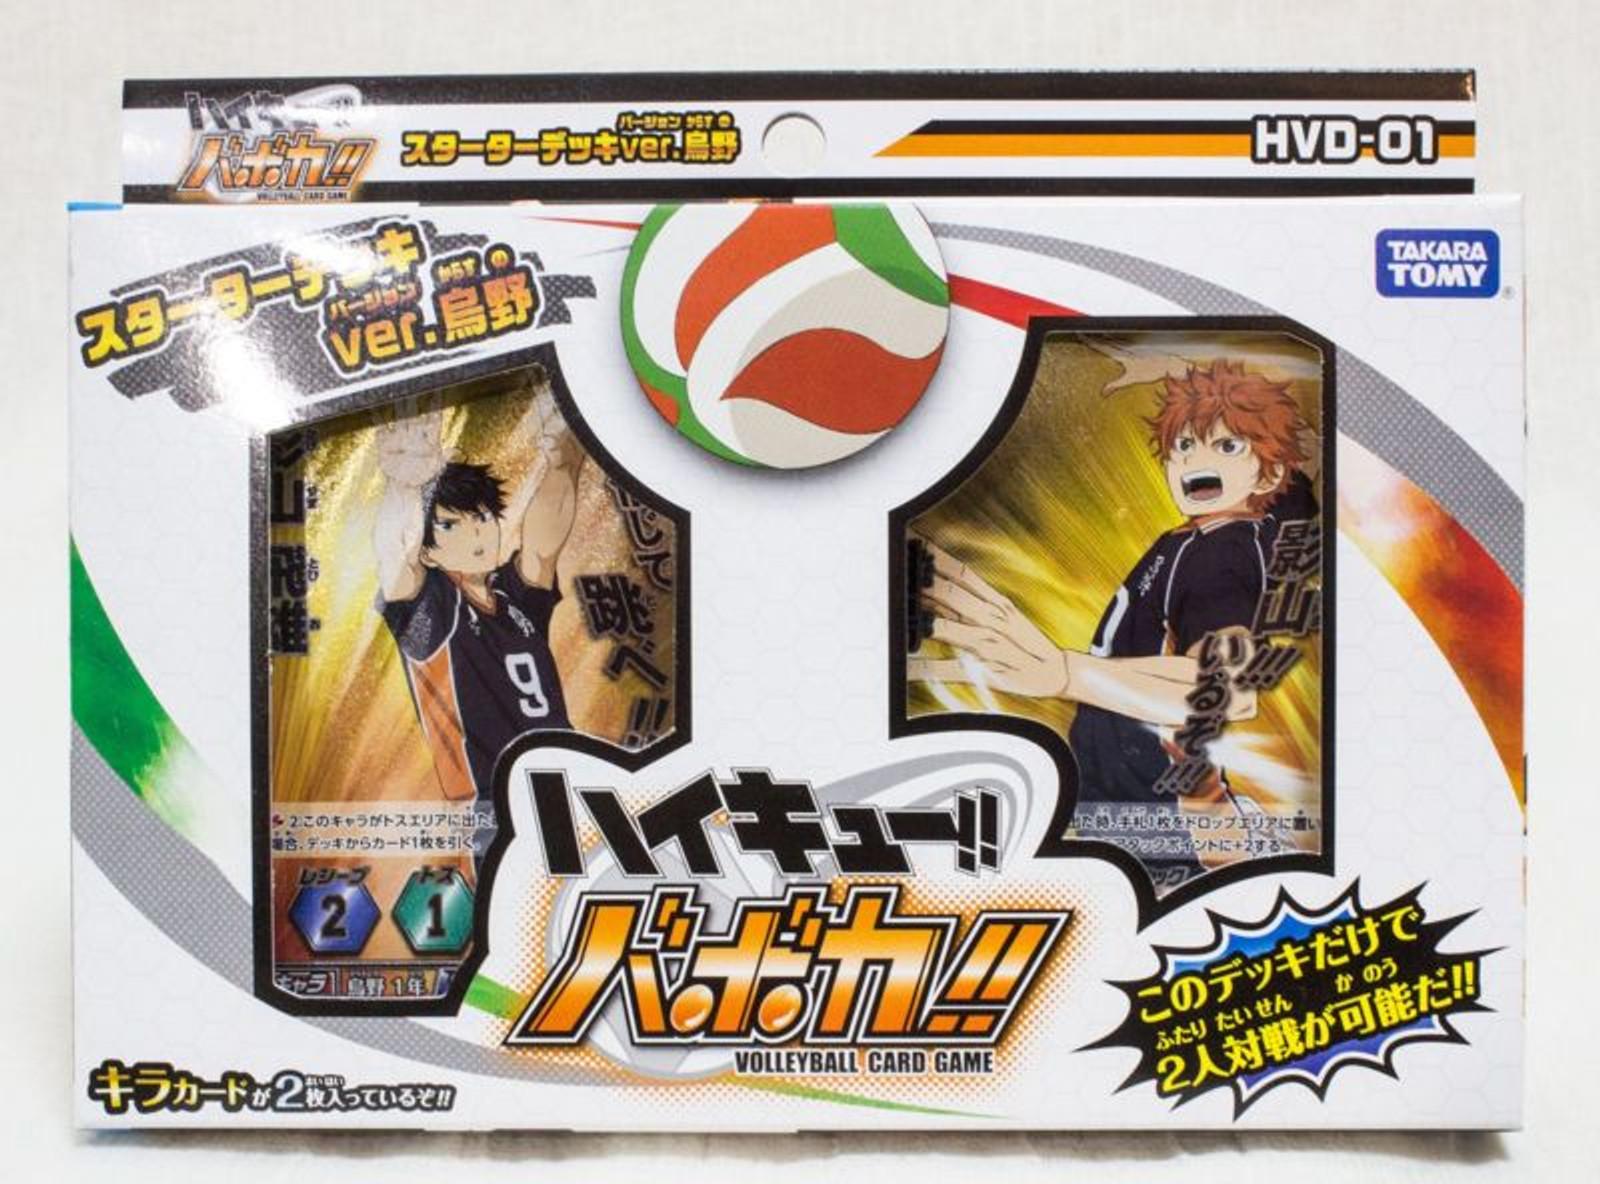 Haikyu!! Baboka Valleyball Card Game Starter Deck Ver. Karasuno HVD-01 JAPAN ANIME